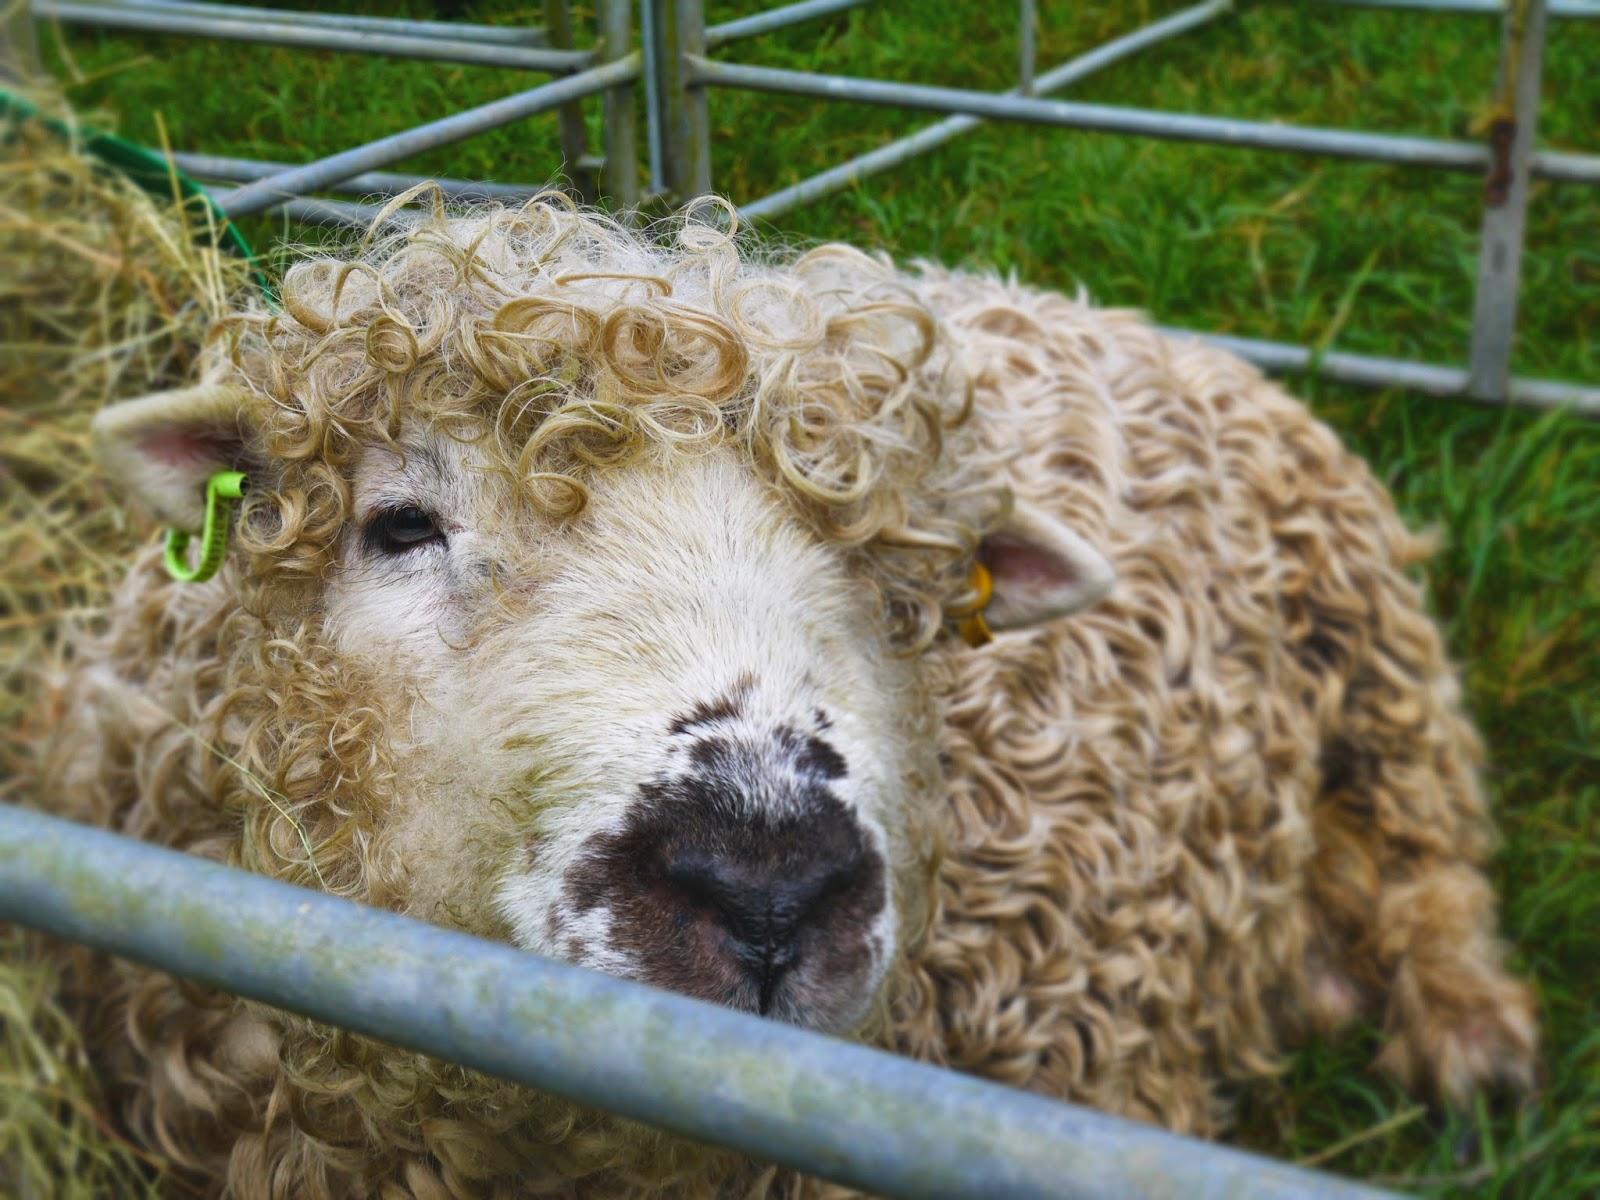 Sheep at Mid Somerset House